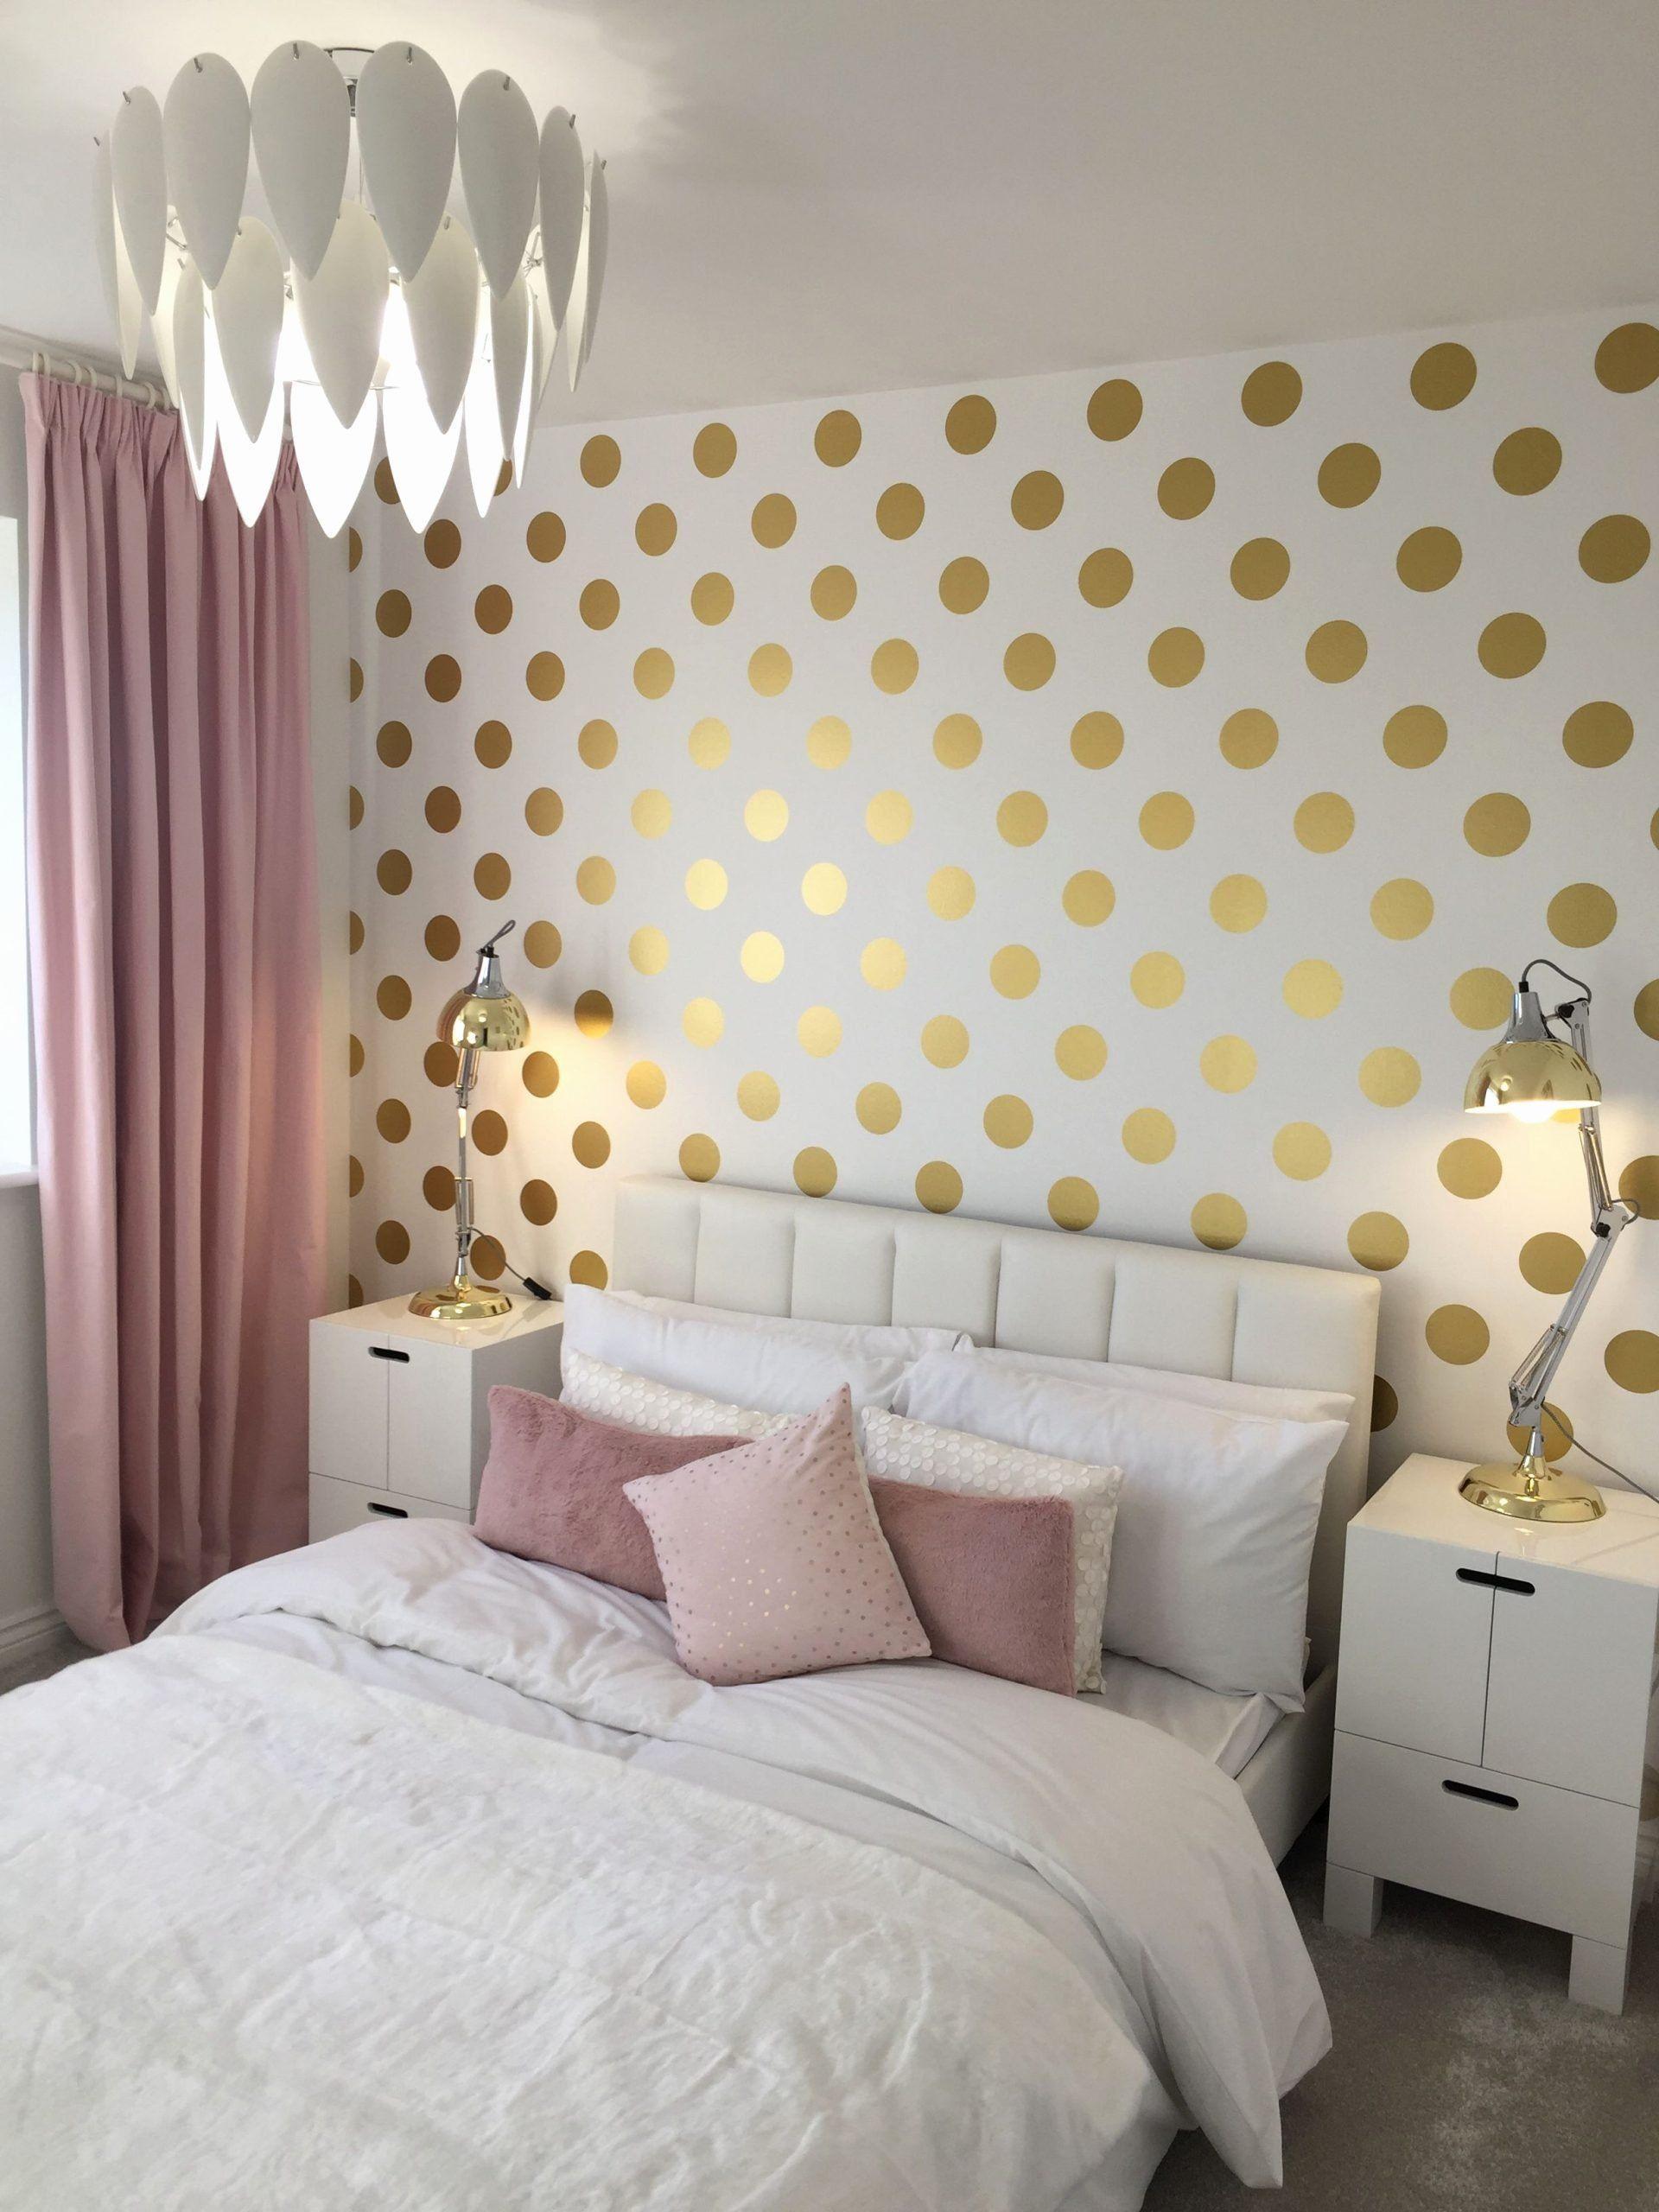 Polka Dot Bedroom Ideas Elegant Polka Dot Bedroom Pink And Gold Feature Wall In 2020 Girls Bedroom Green Girls Bedroom Wallpaper Pink Bedroom Decor